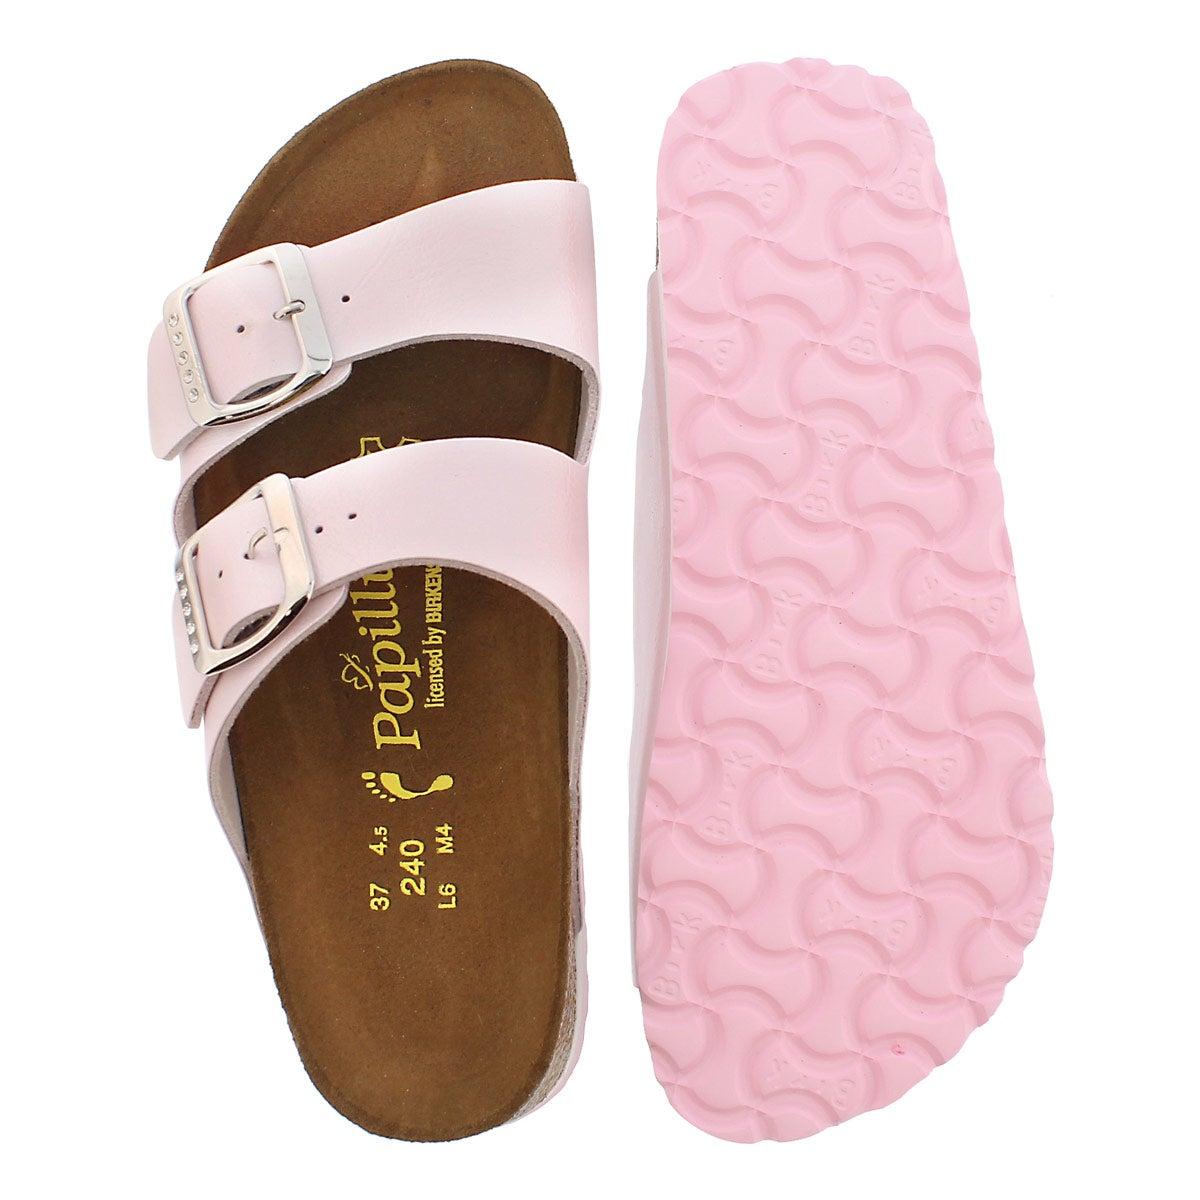 Lds Arizona rose platform sandal-Narrow